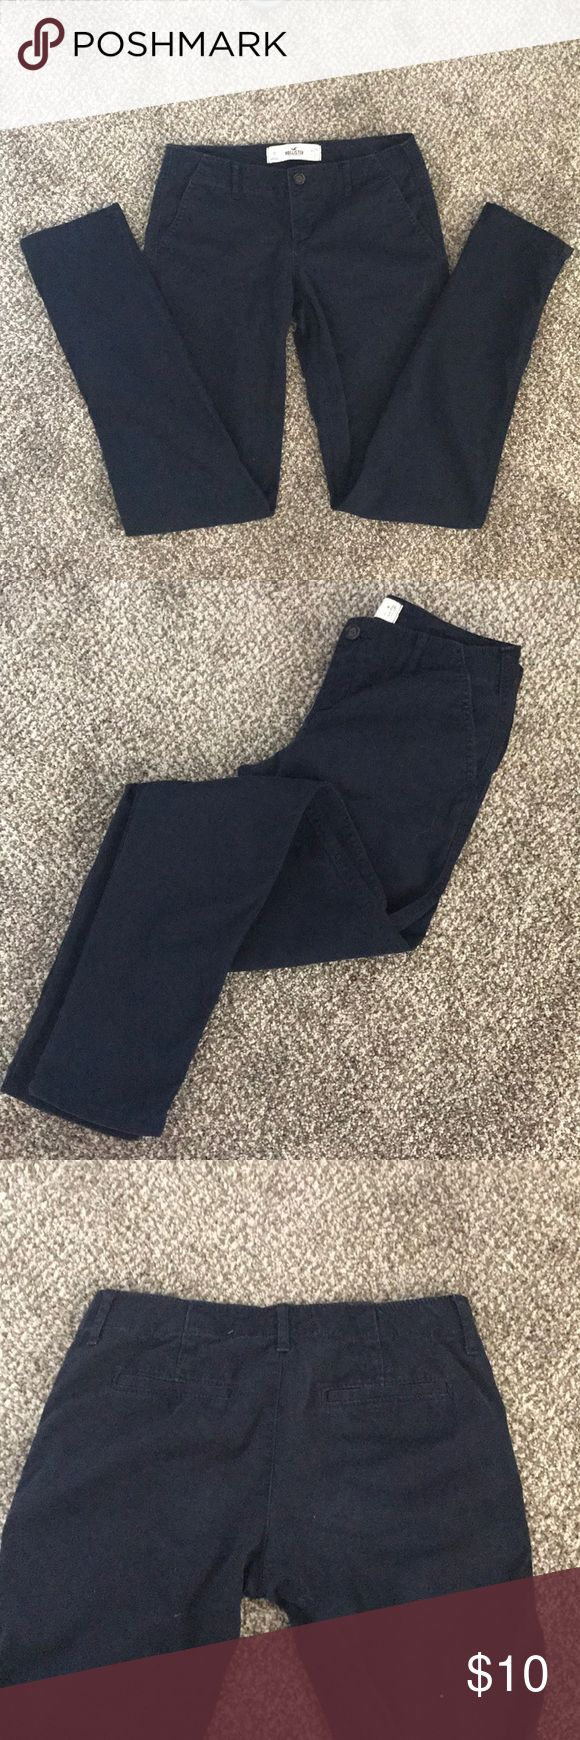 Navy Blue Hollister Chinos Barely worn slim leg navy blue chinos by hollister. Hollister Pants Trousers